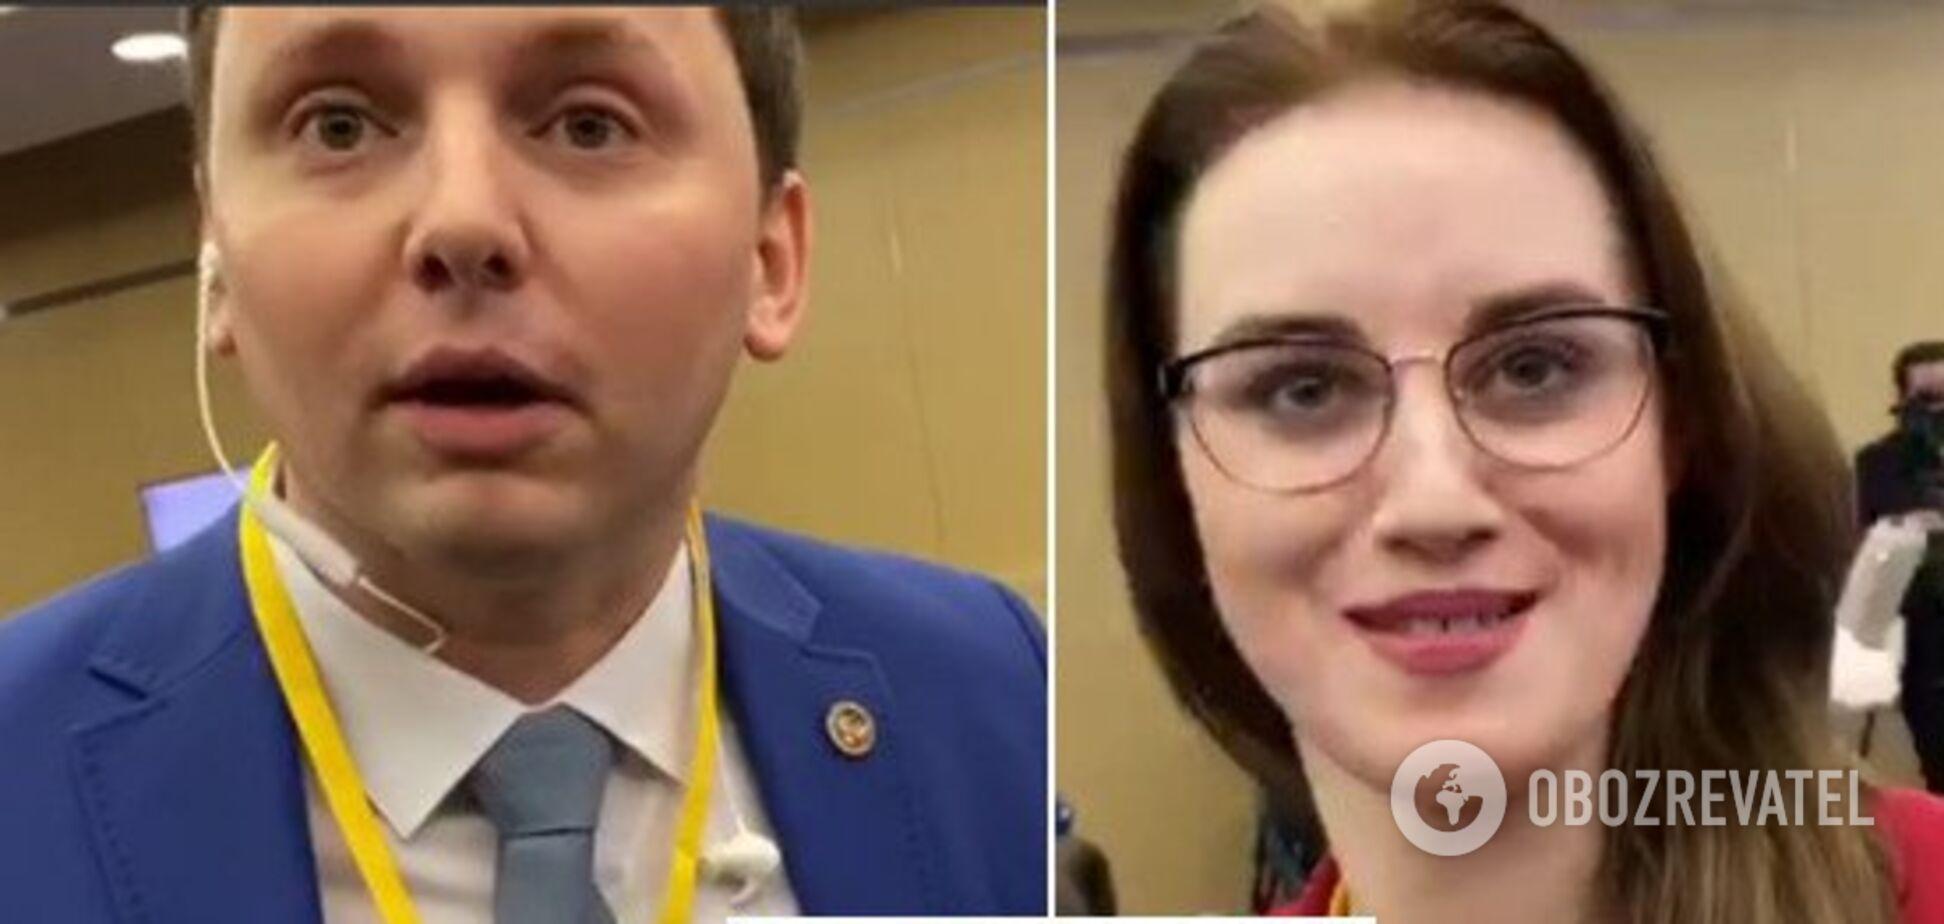 Цимбалюк и пропагандисты Л/ДНР